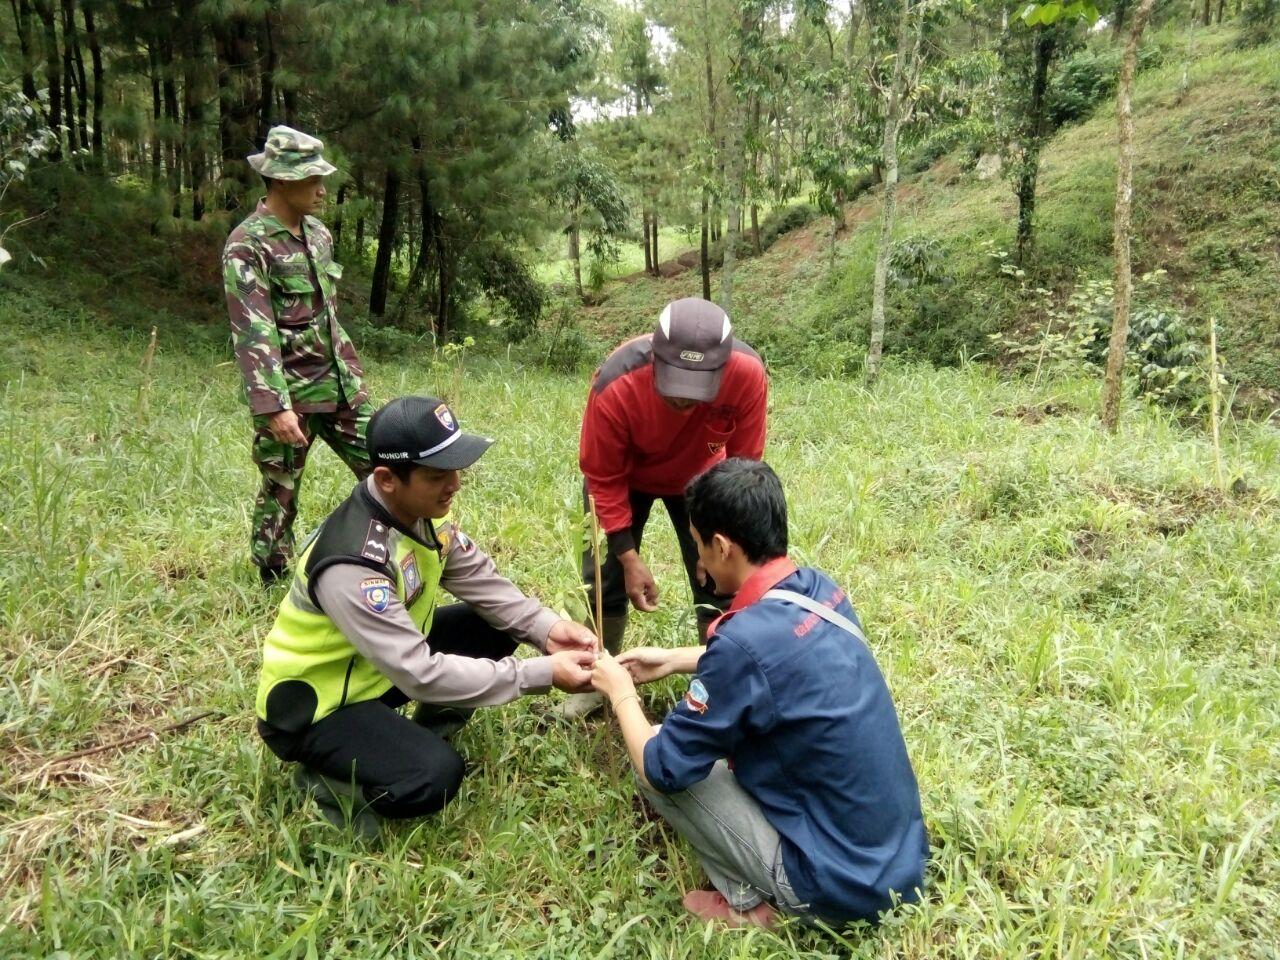 Binmas Polres Batu Dalam Kegiatan Penghijauan Di Desa Madiredo